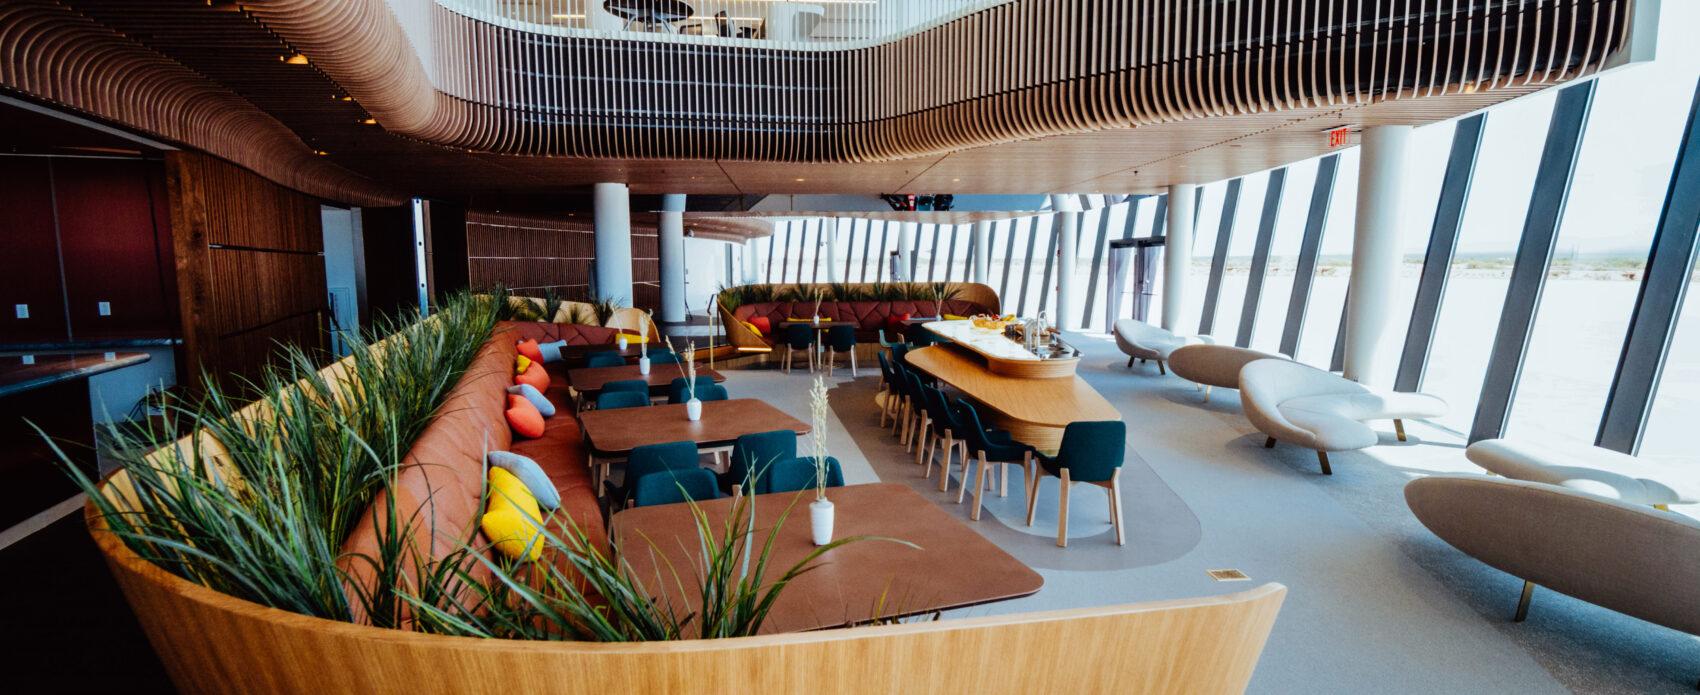 Gaia Lounge Dinning Area